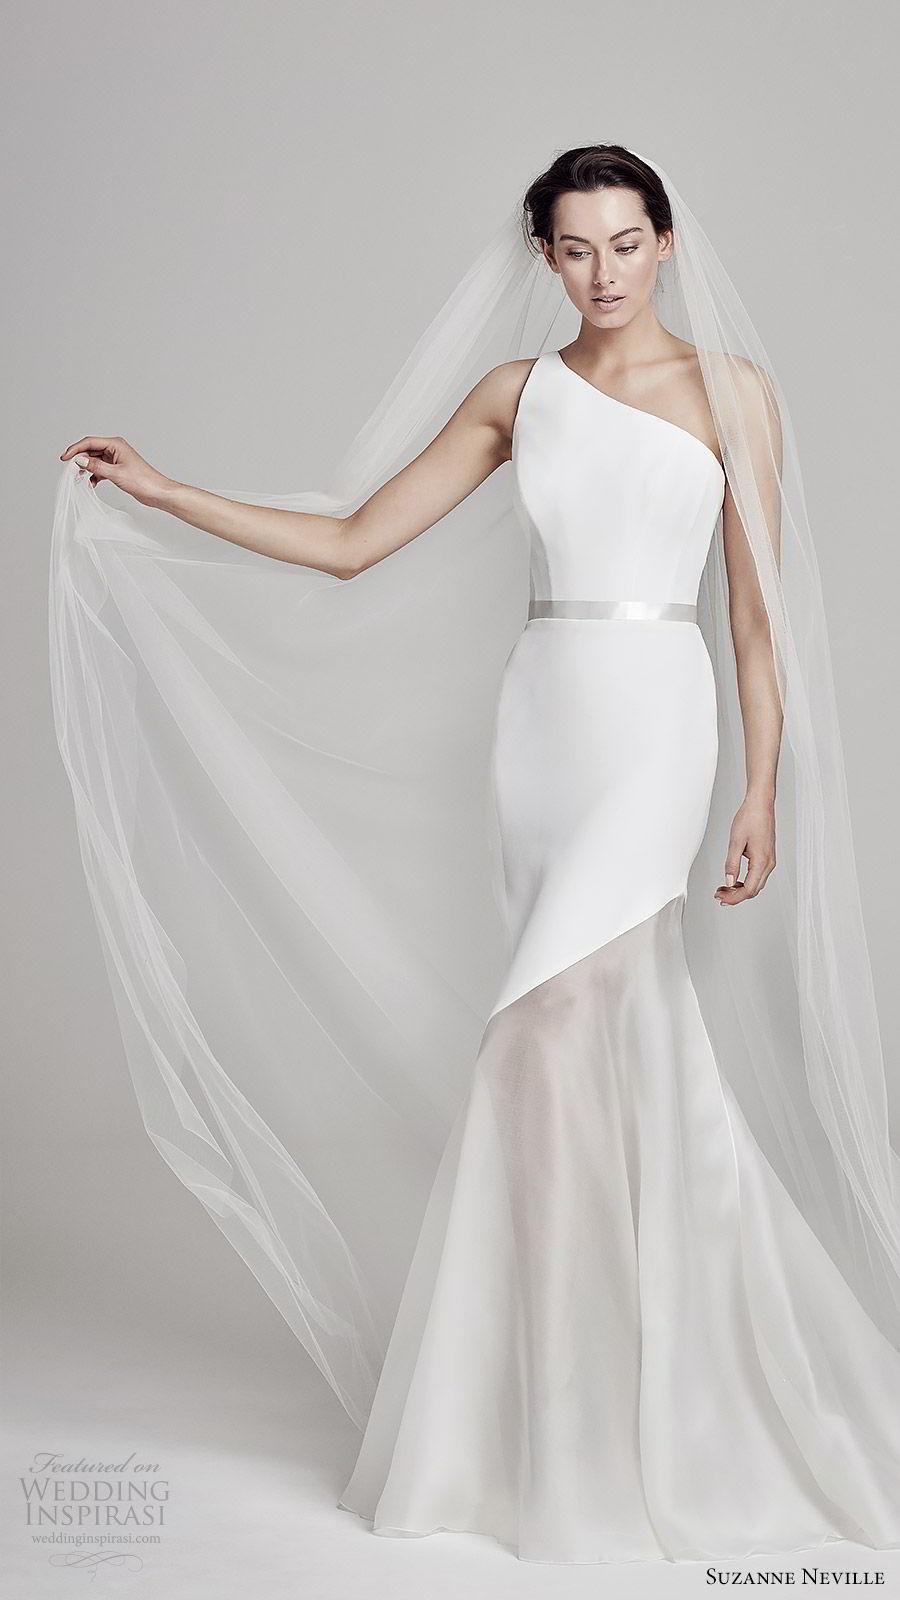 suzanne neville bridal 2019 sleeveless one shoulder mermaid wedding dress (dahl) sweep train chic modern minimal mv